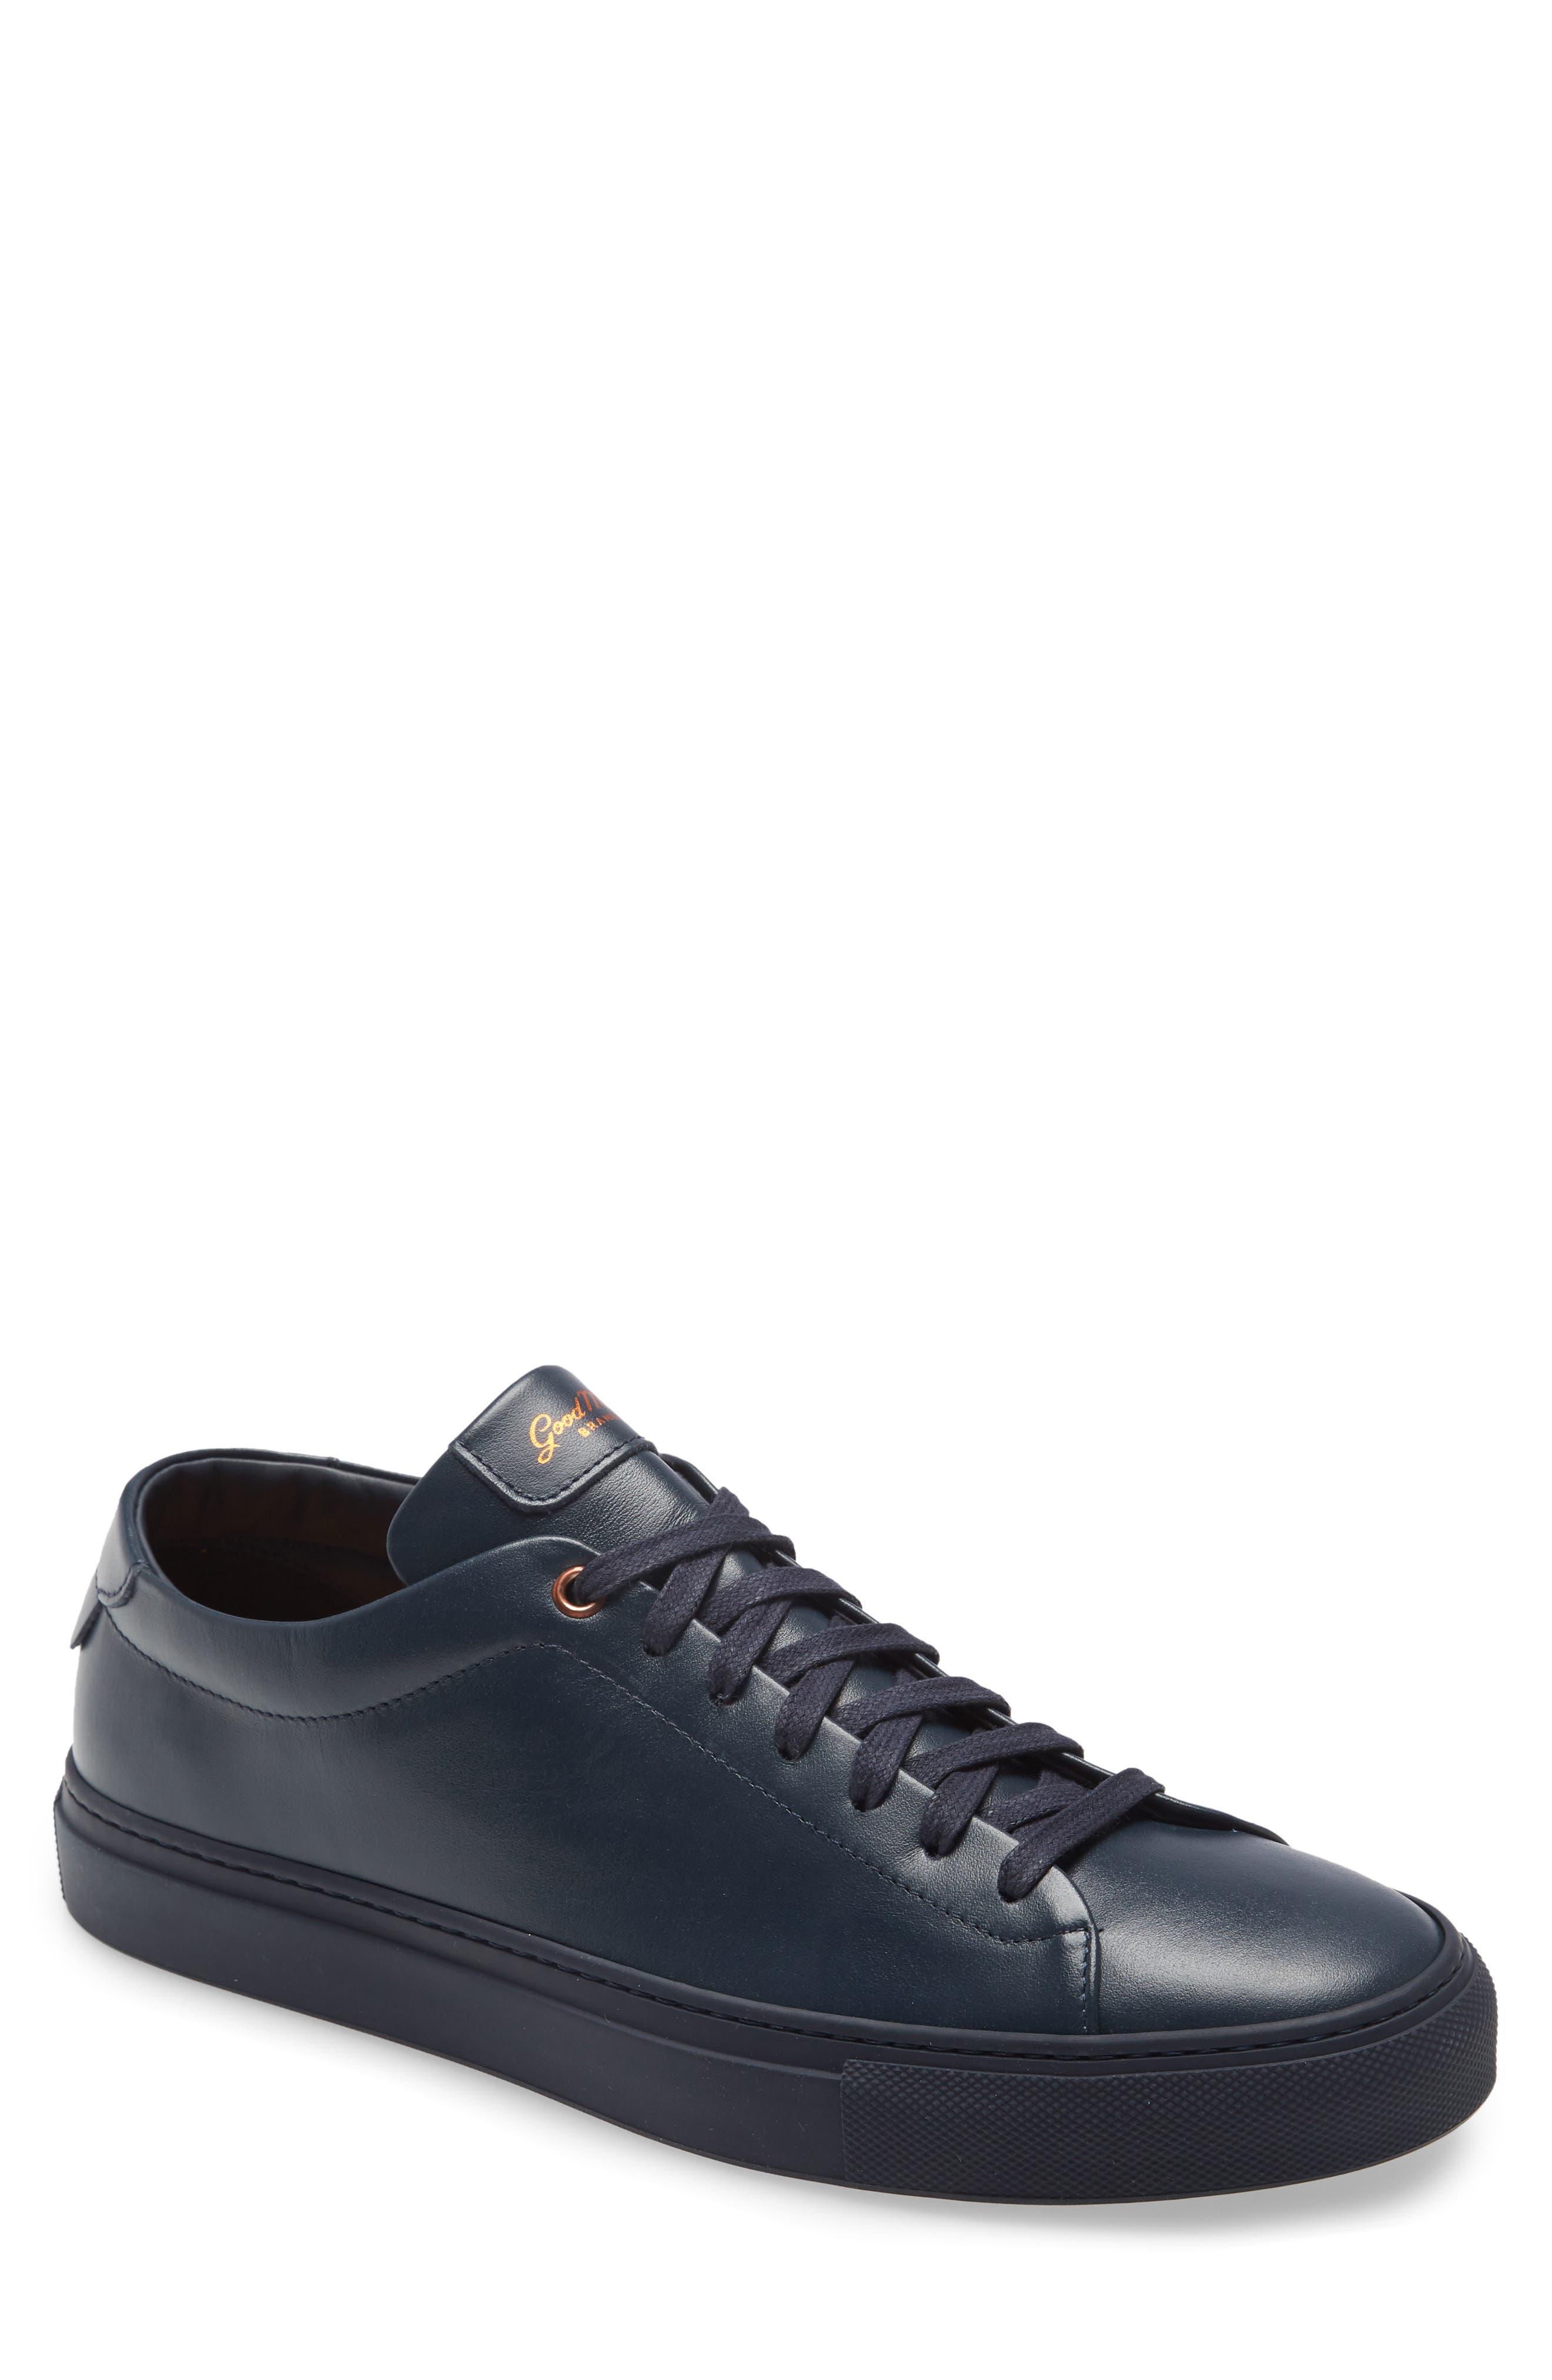 Men's Blue Dress Sneakers   Nordstrom